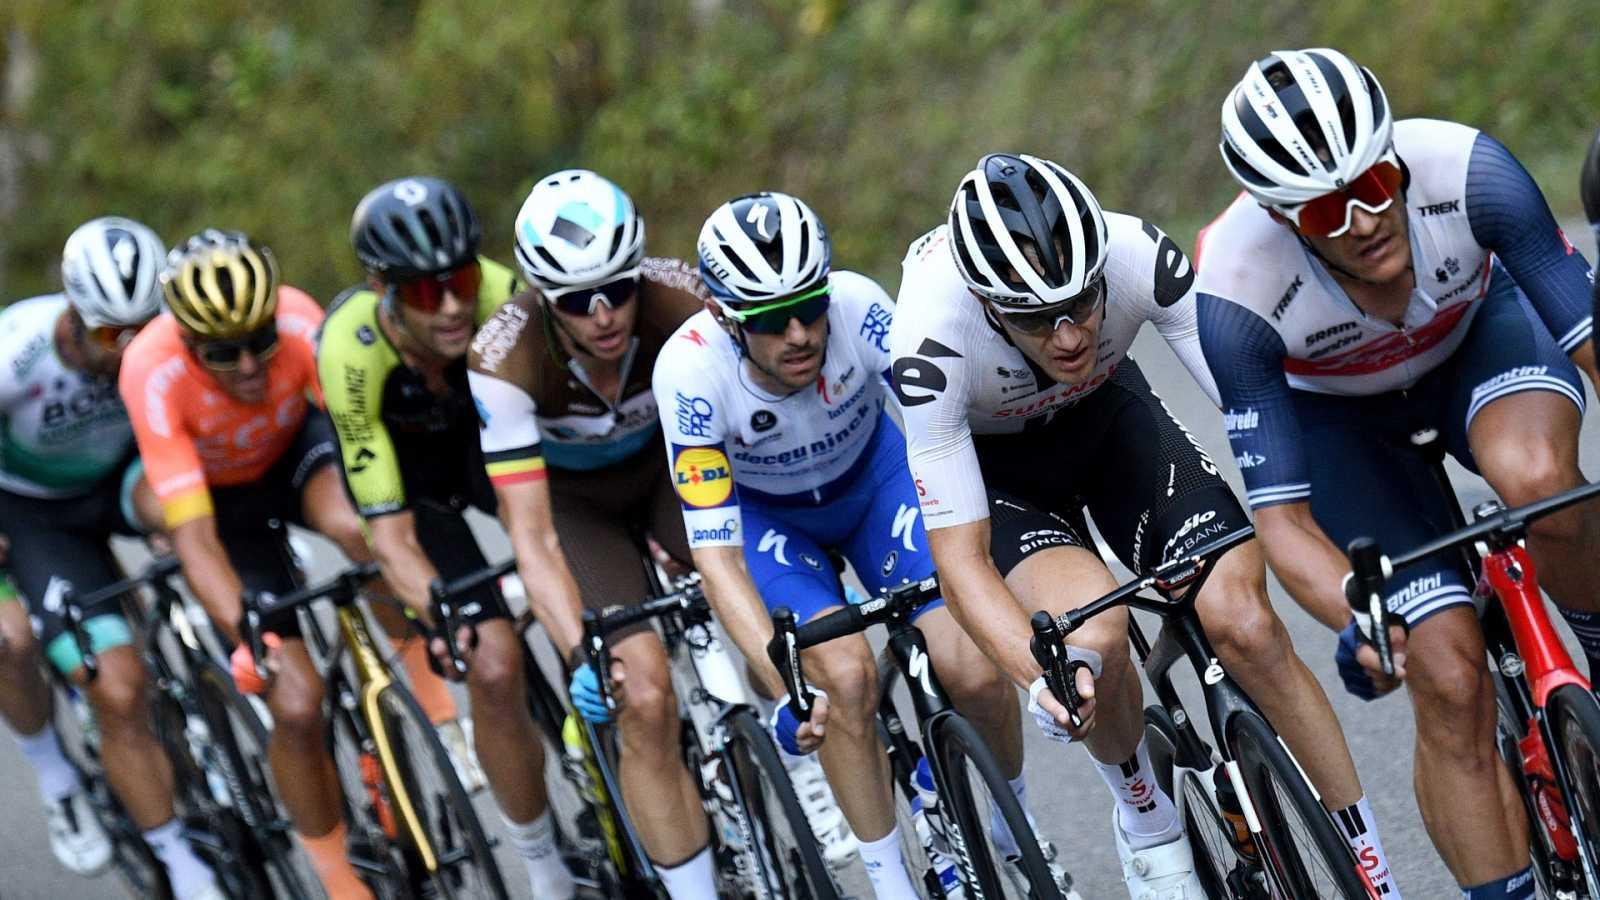 Ciclismo - Tour de Francia - 19ª etapa: Bourg-en-Bresse - Champagnole - ver ahora